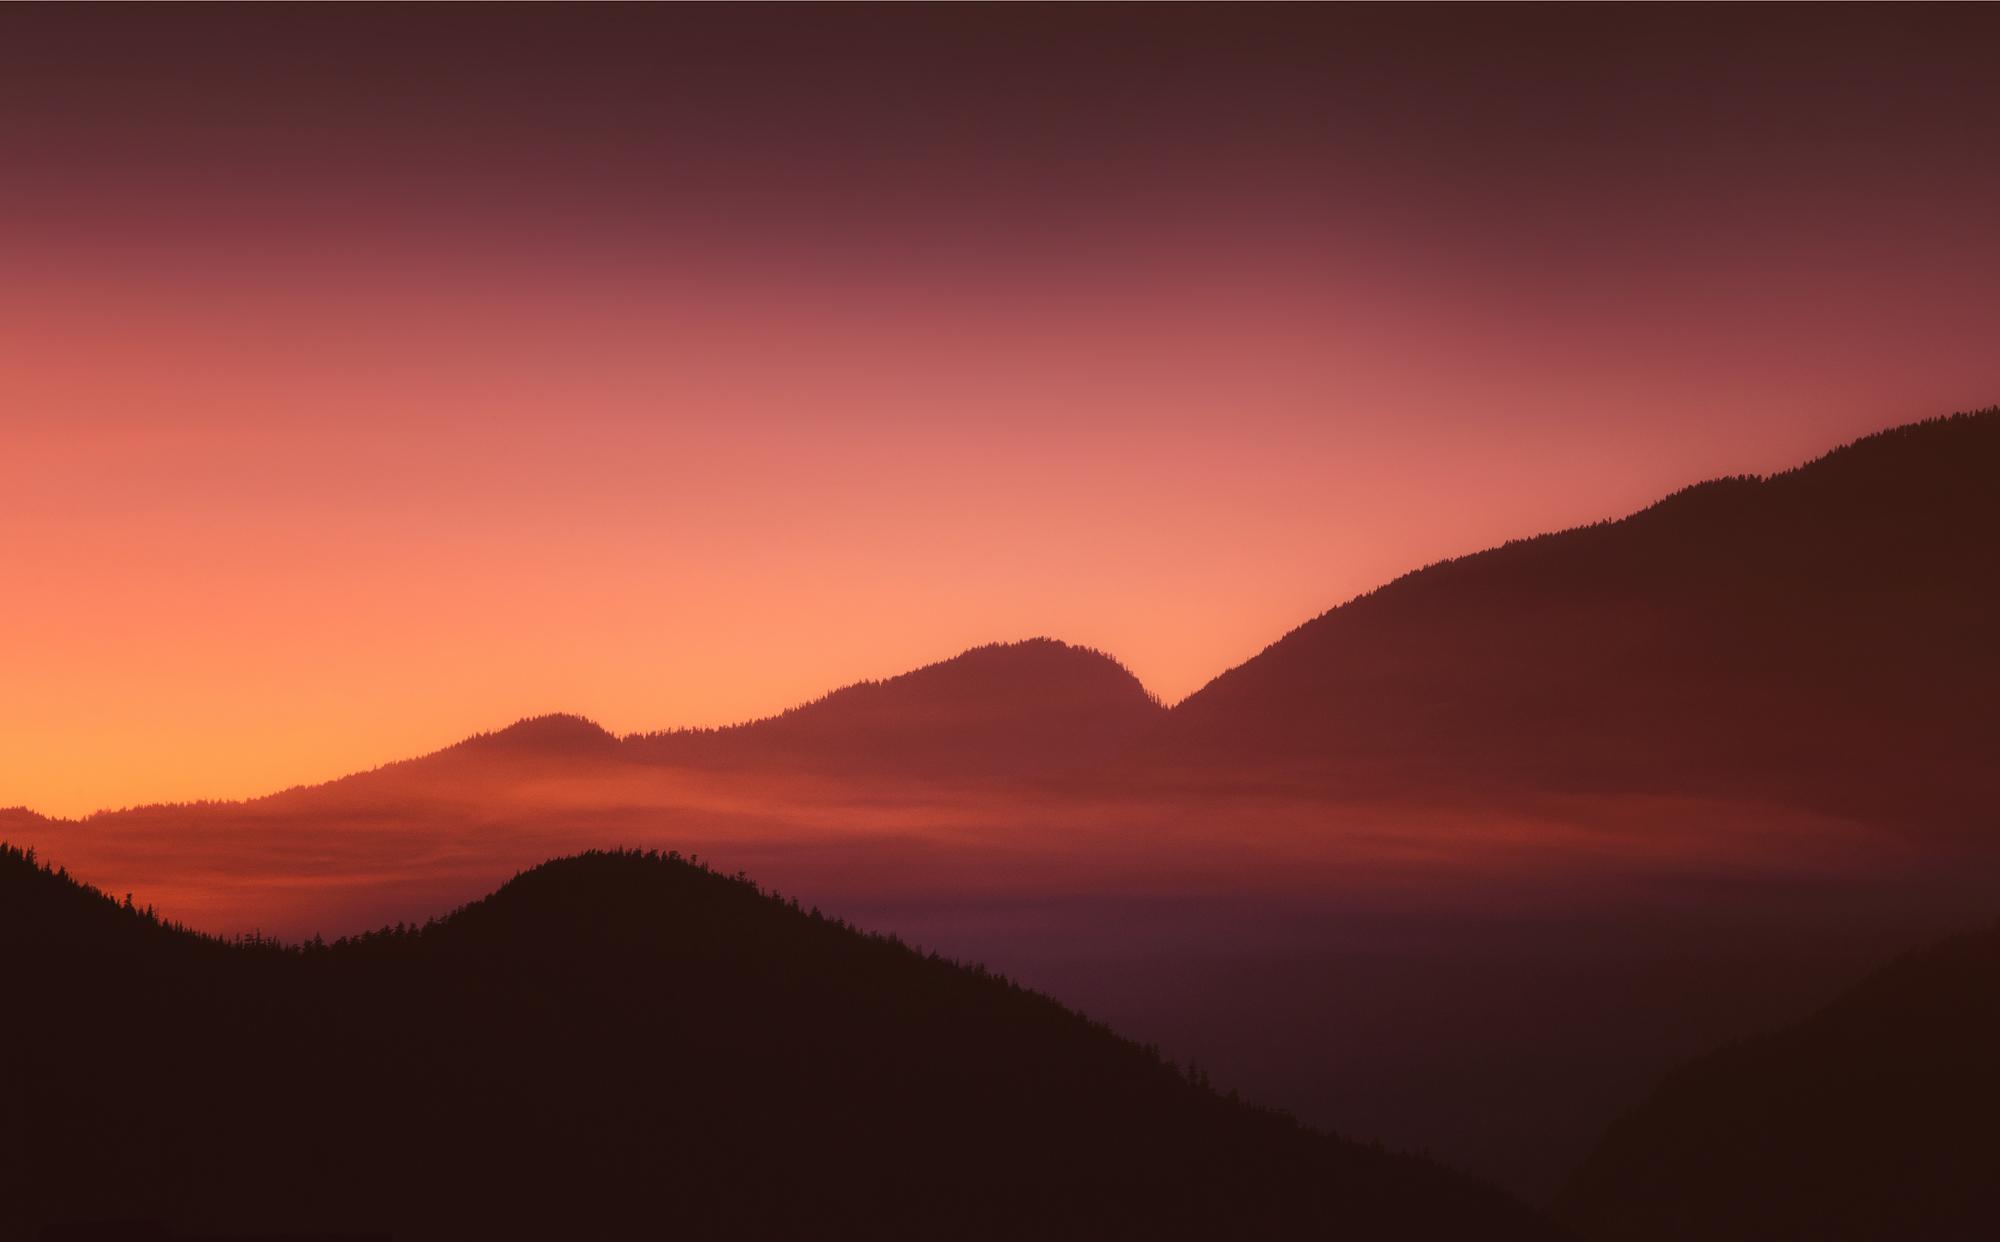 Atmospherics_Proteau_Cove_Cloud_Mountain_Dusk_Light_2000px.jpg